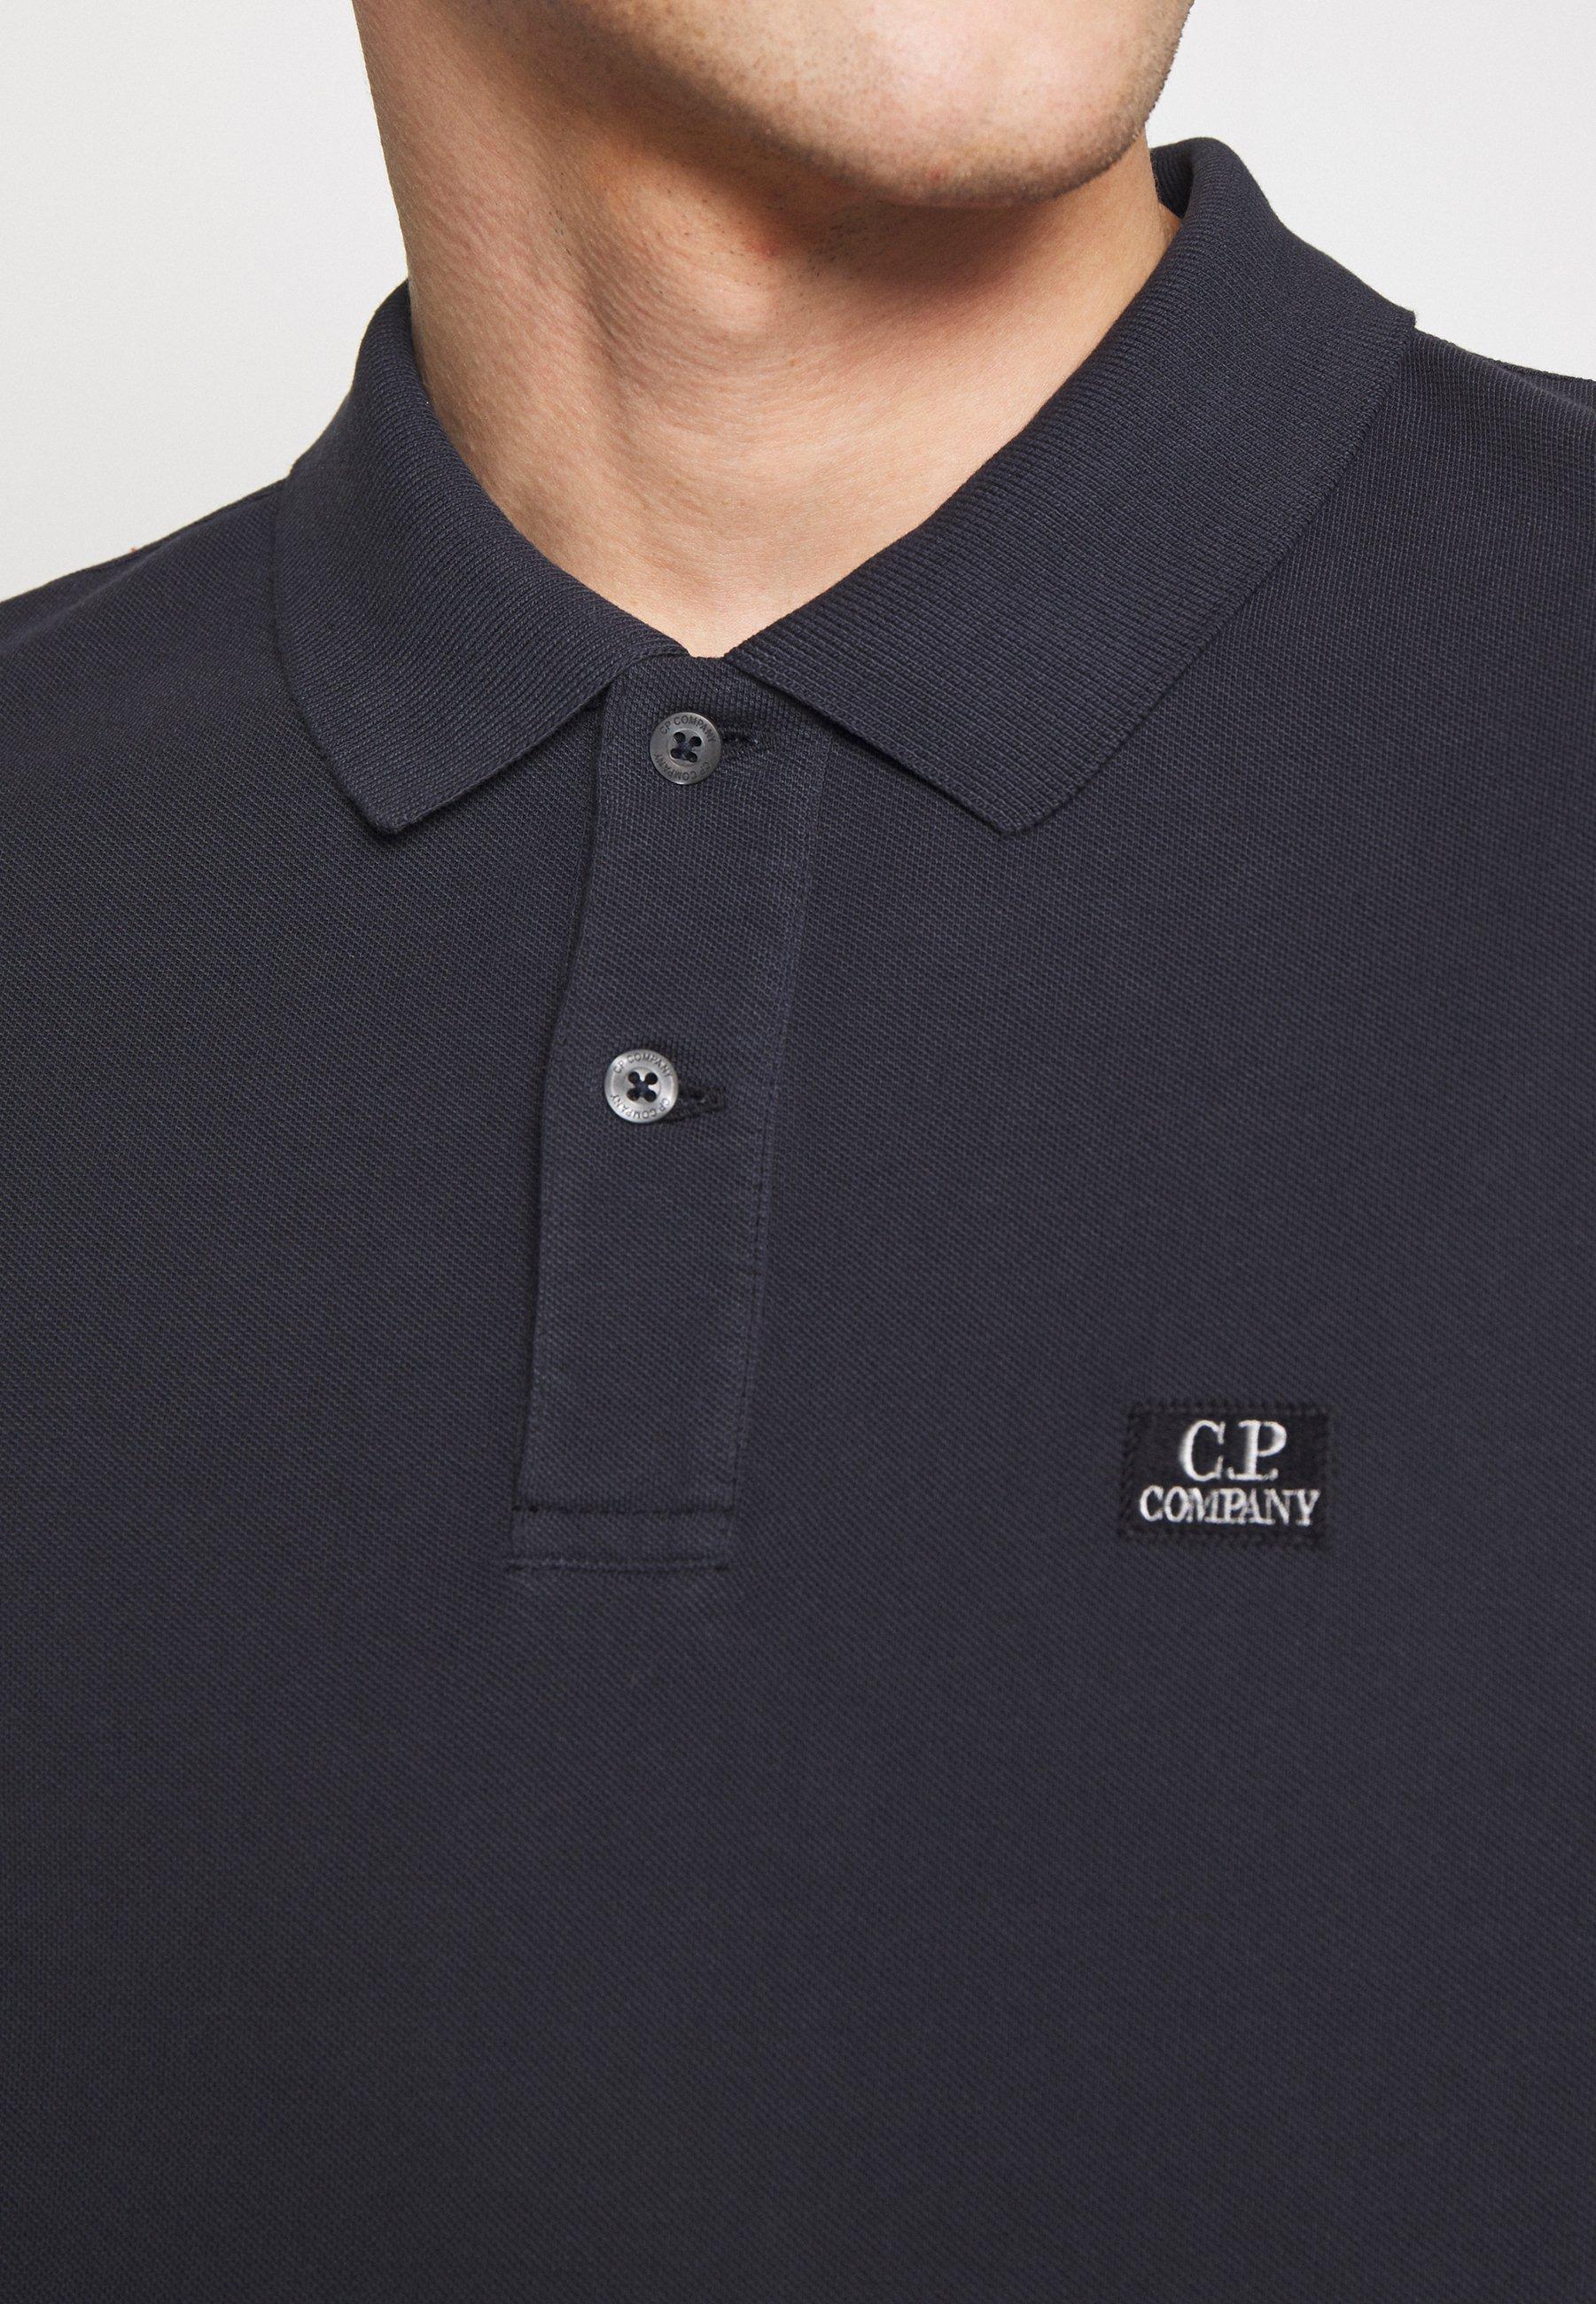 C.p. Company Poloshirt - Navy 7Kp1QYI